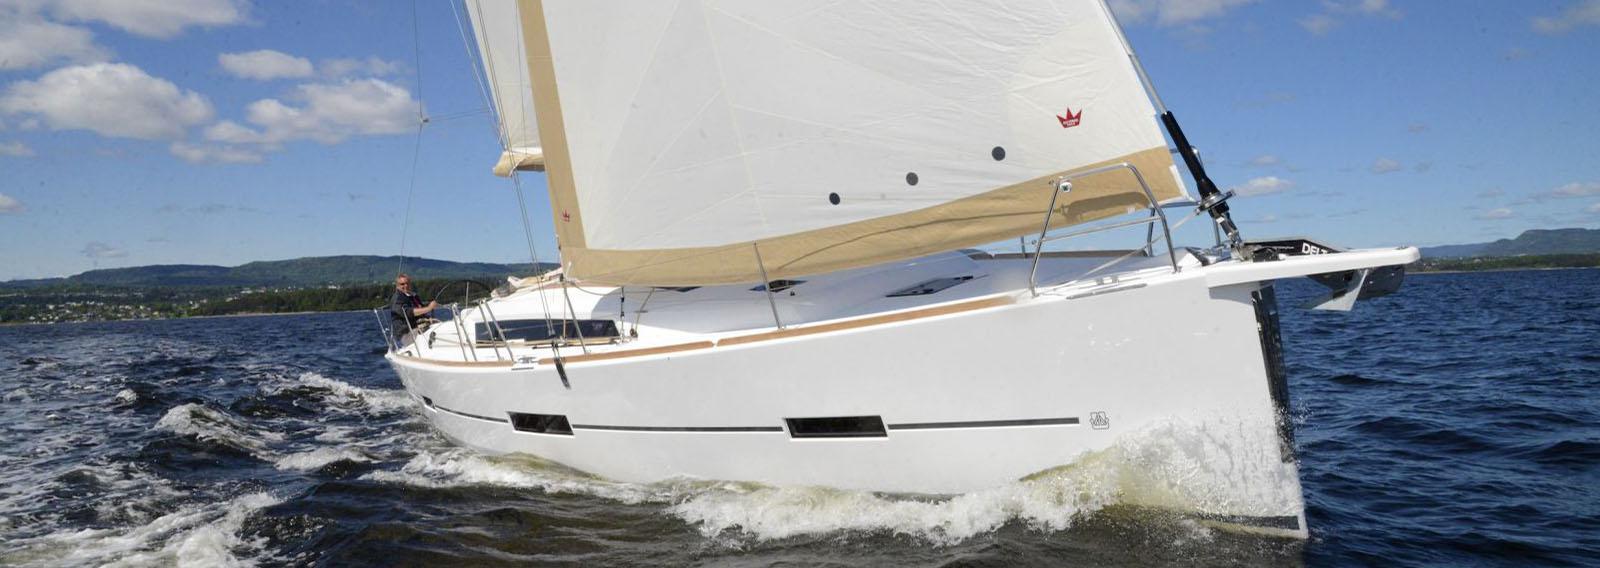 Catamaran Vs  Monohull - How to Choose? - Queensland Yacht